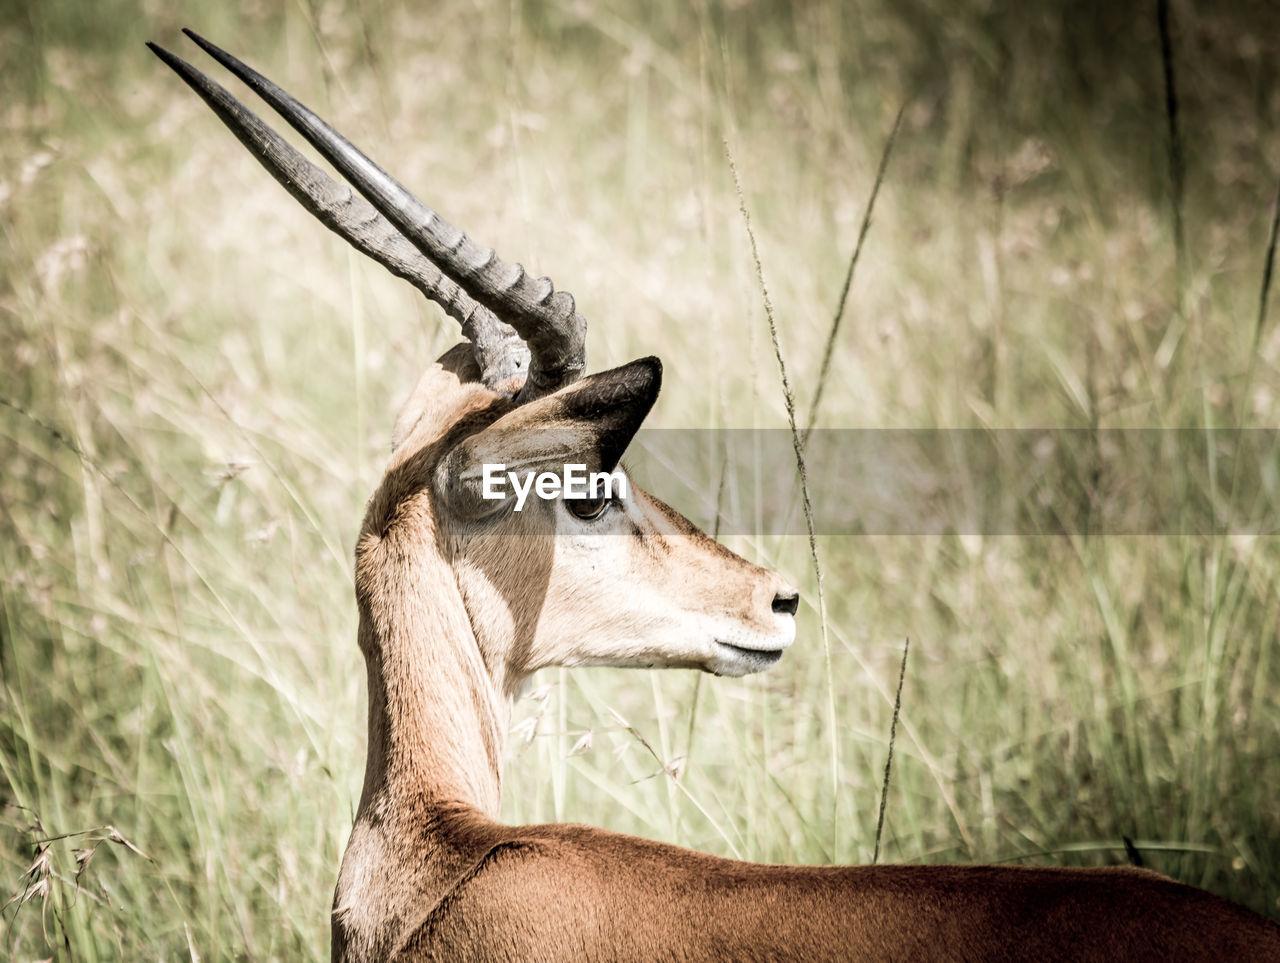 A profile, fine art portrait shot of a gazelle